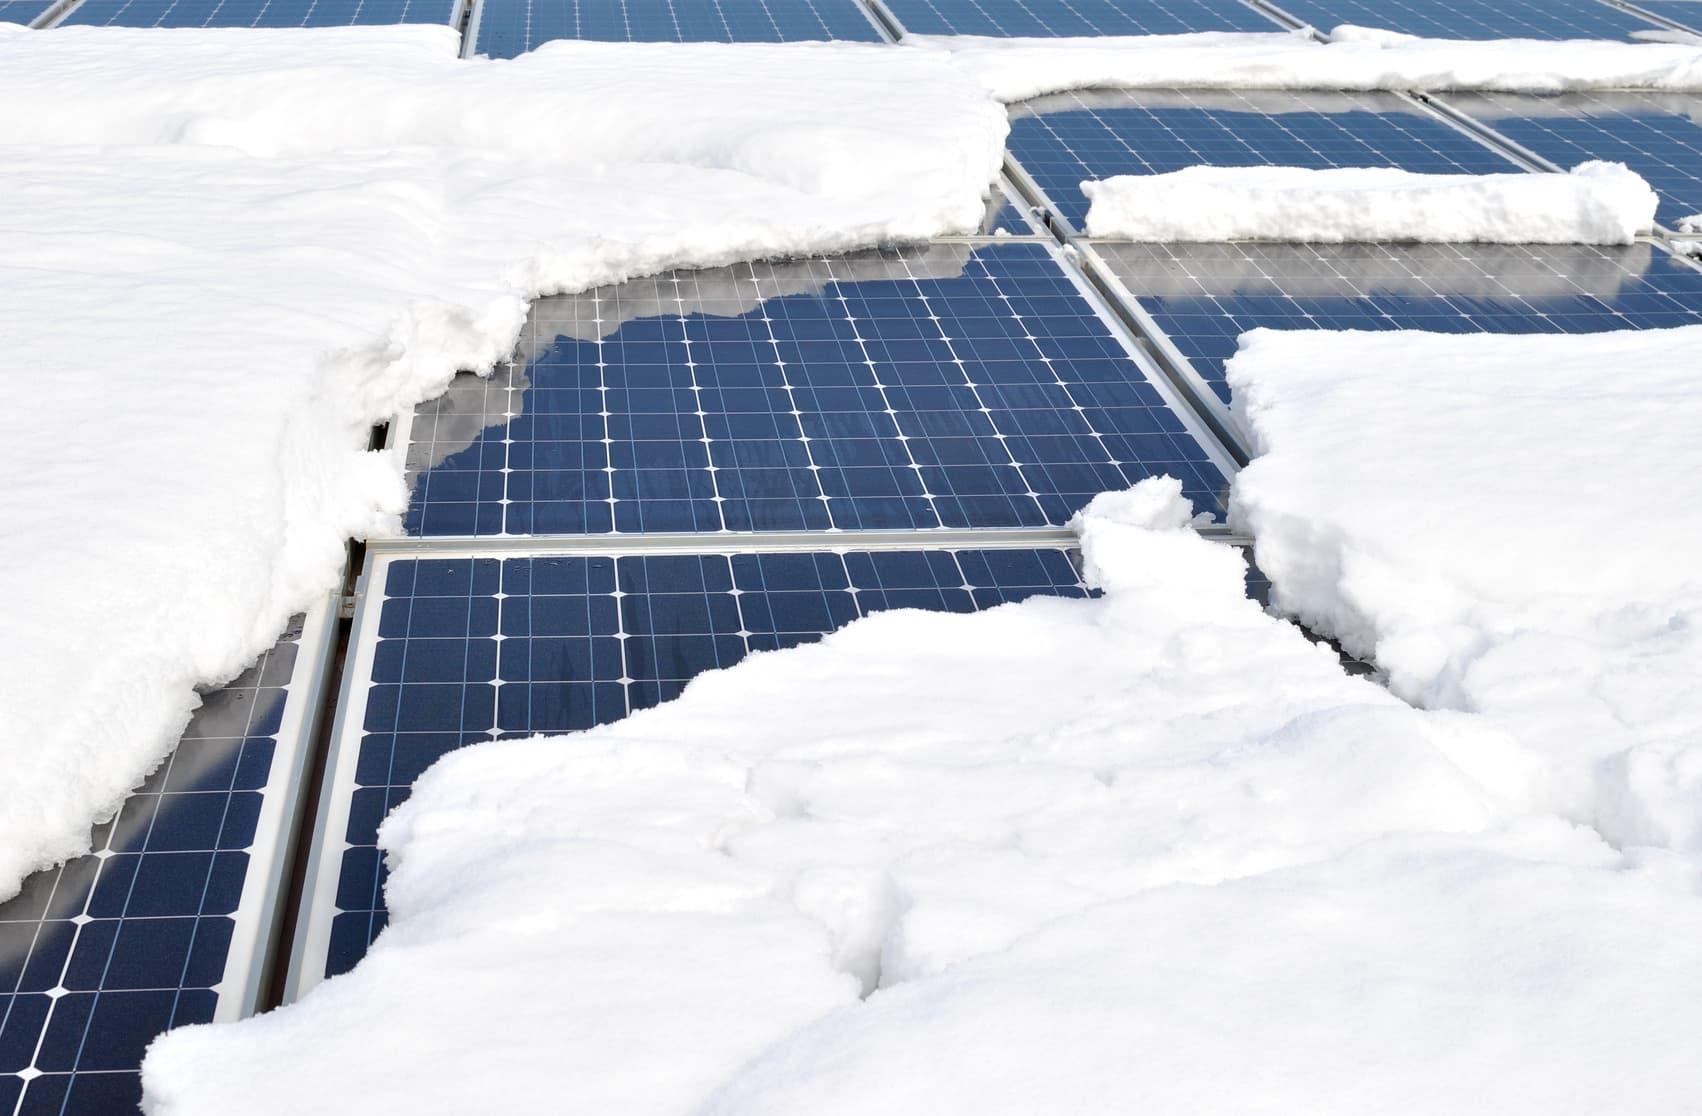 off grid solar in snow